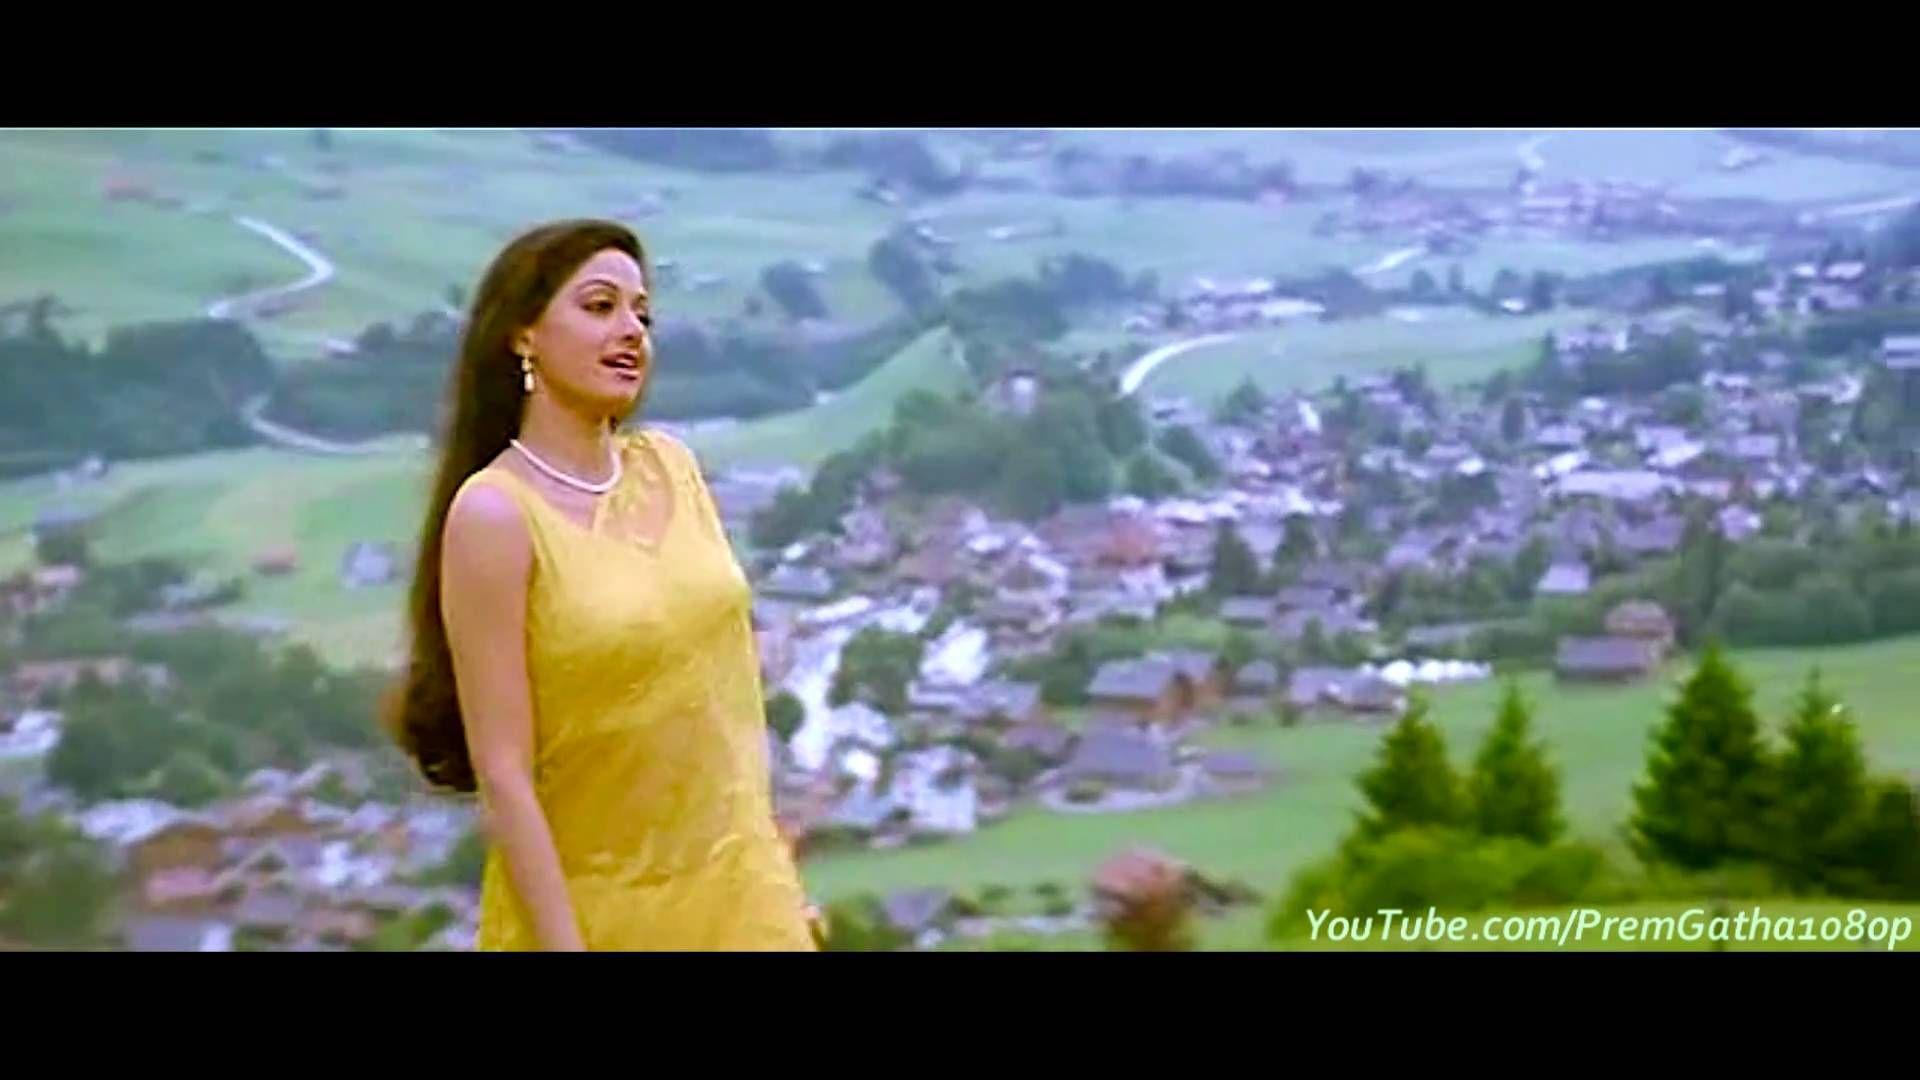 Tere Mere Hoton Pe Mitwa Chandni 1080p Hd Song Bollywood Music Hindi Movie Song Hollywood Music